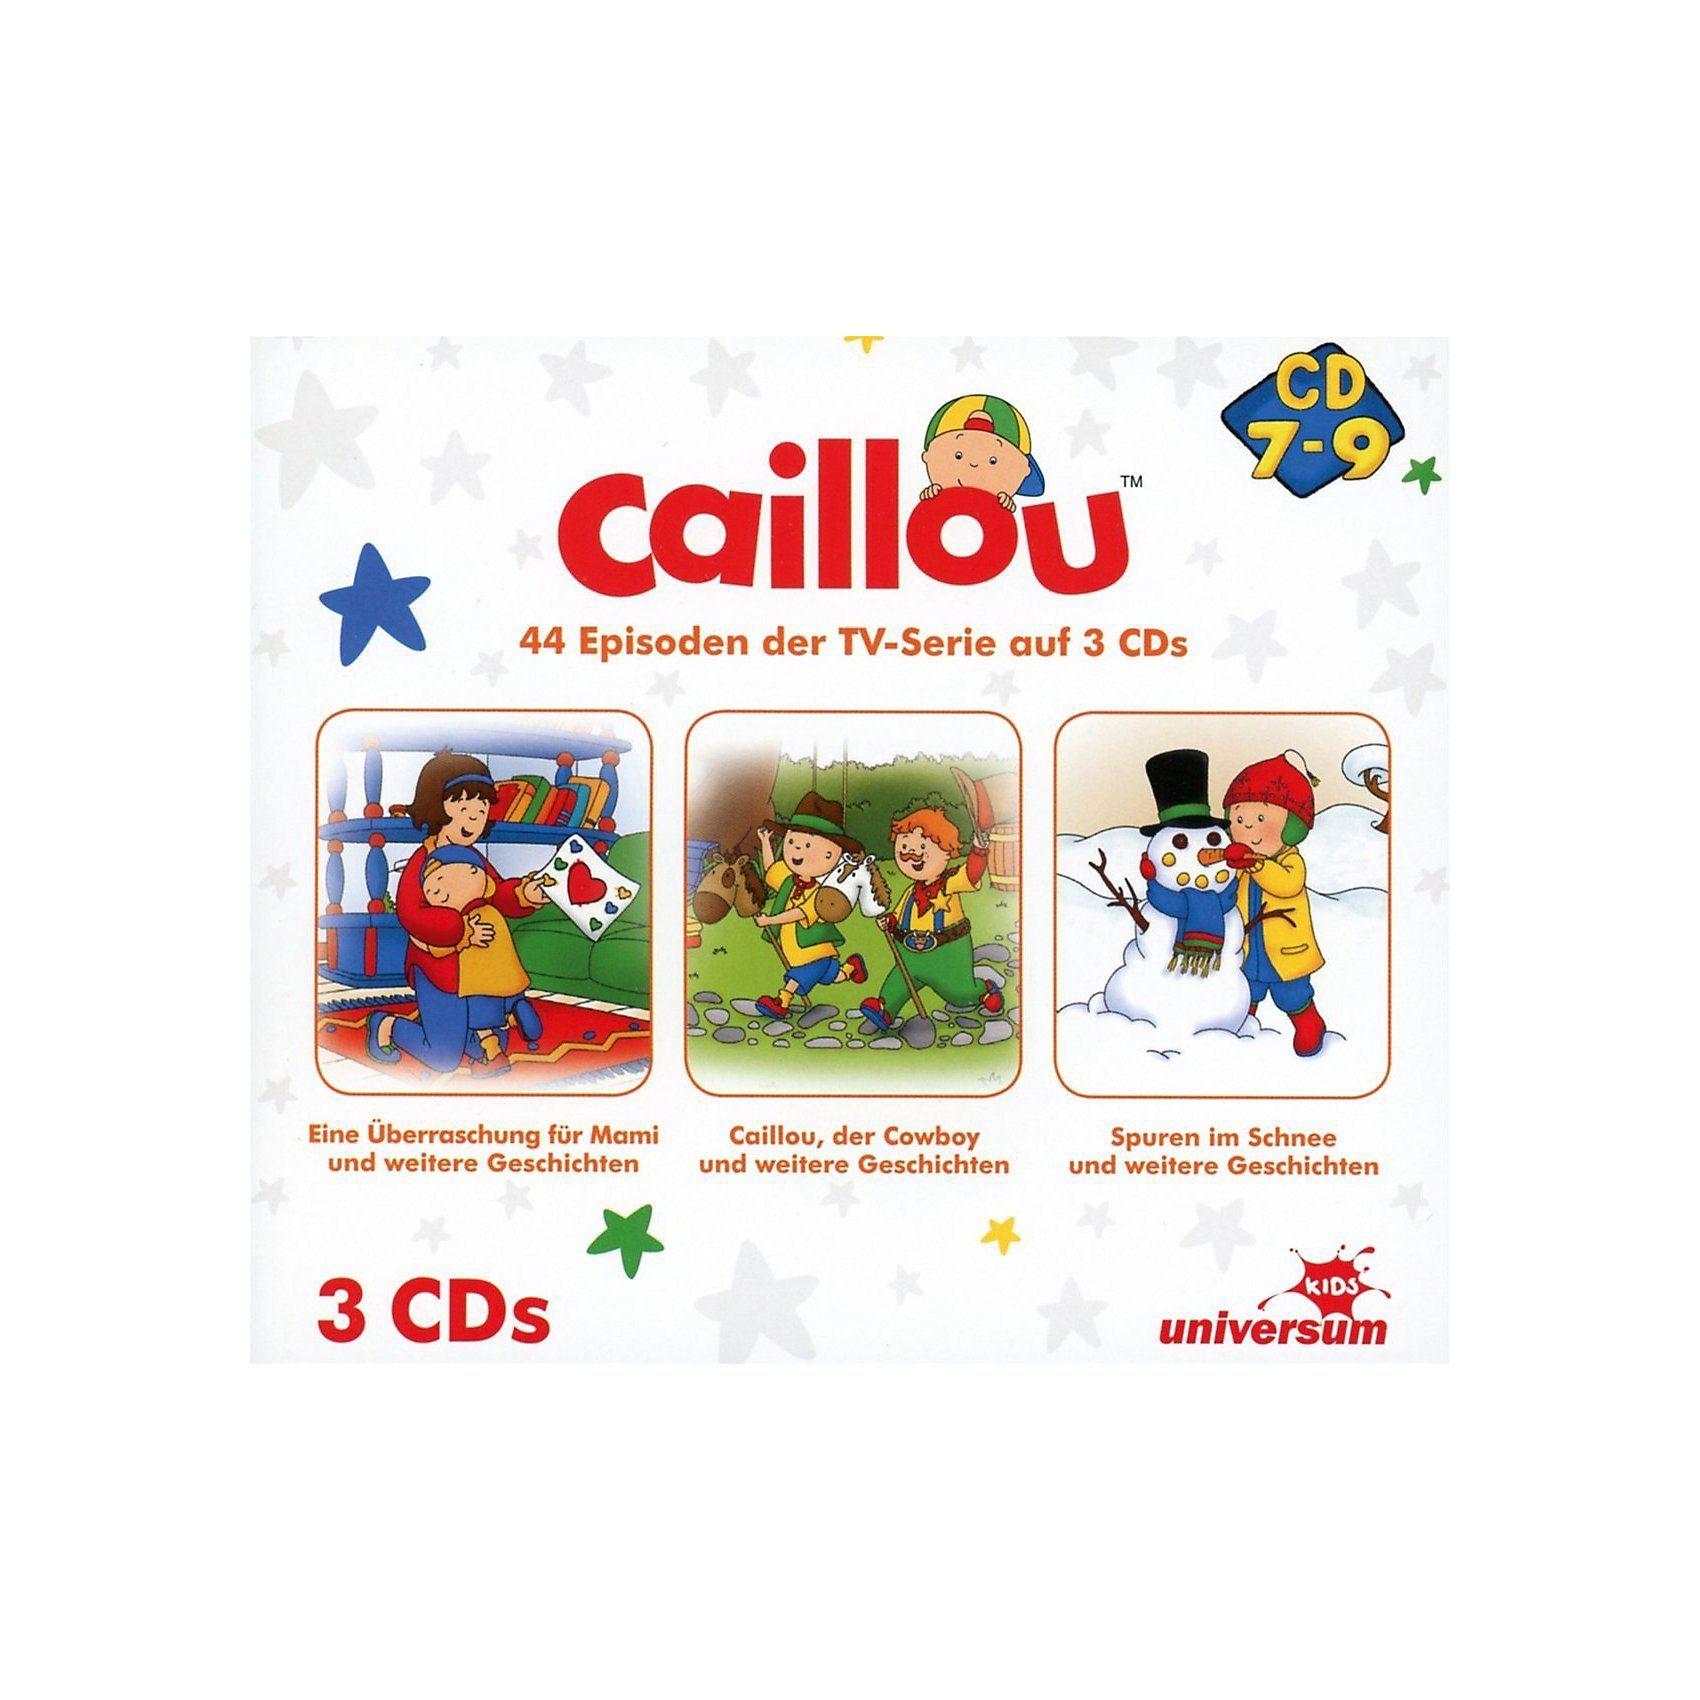 CD Caillou Hörspielbox 3 (CD 7-9)(3 CDs)